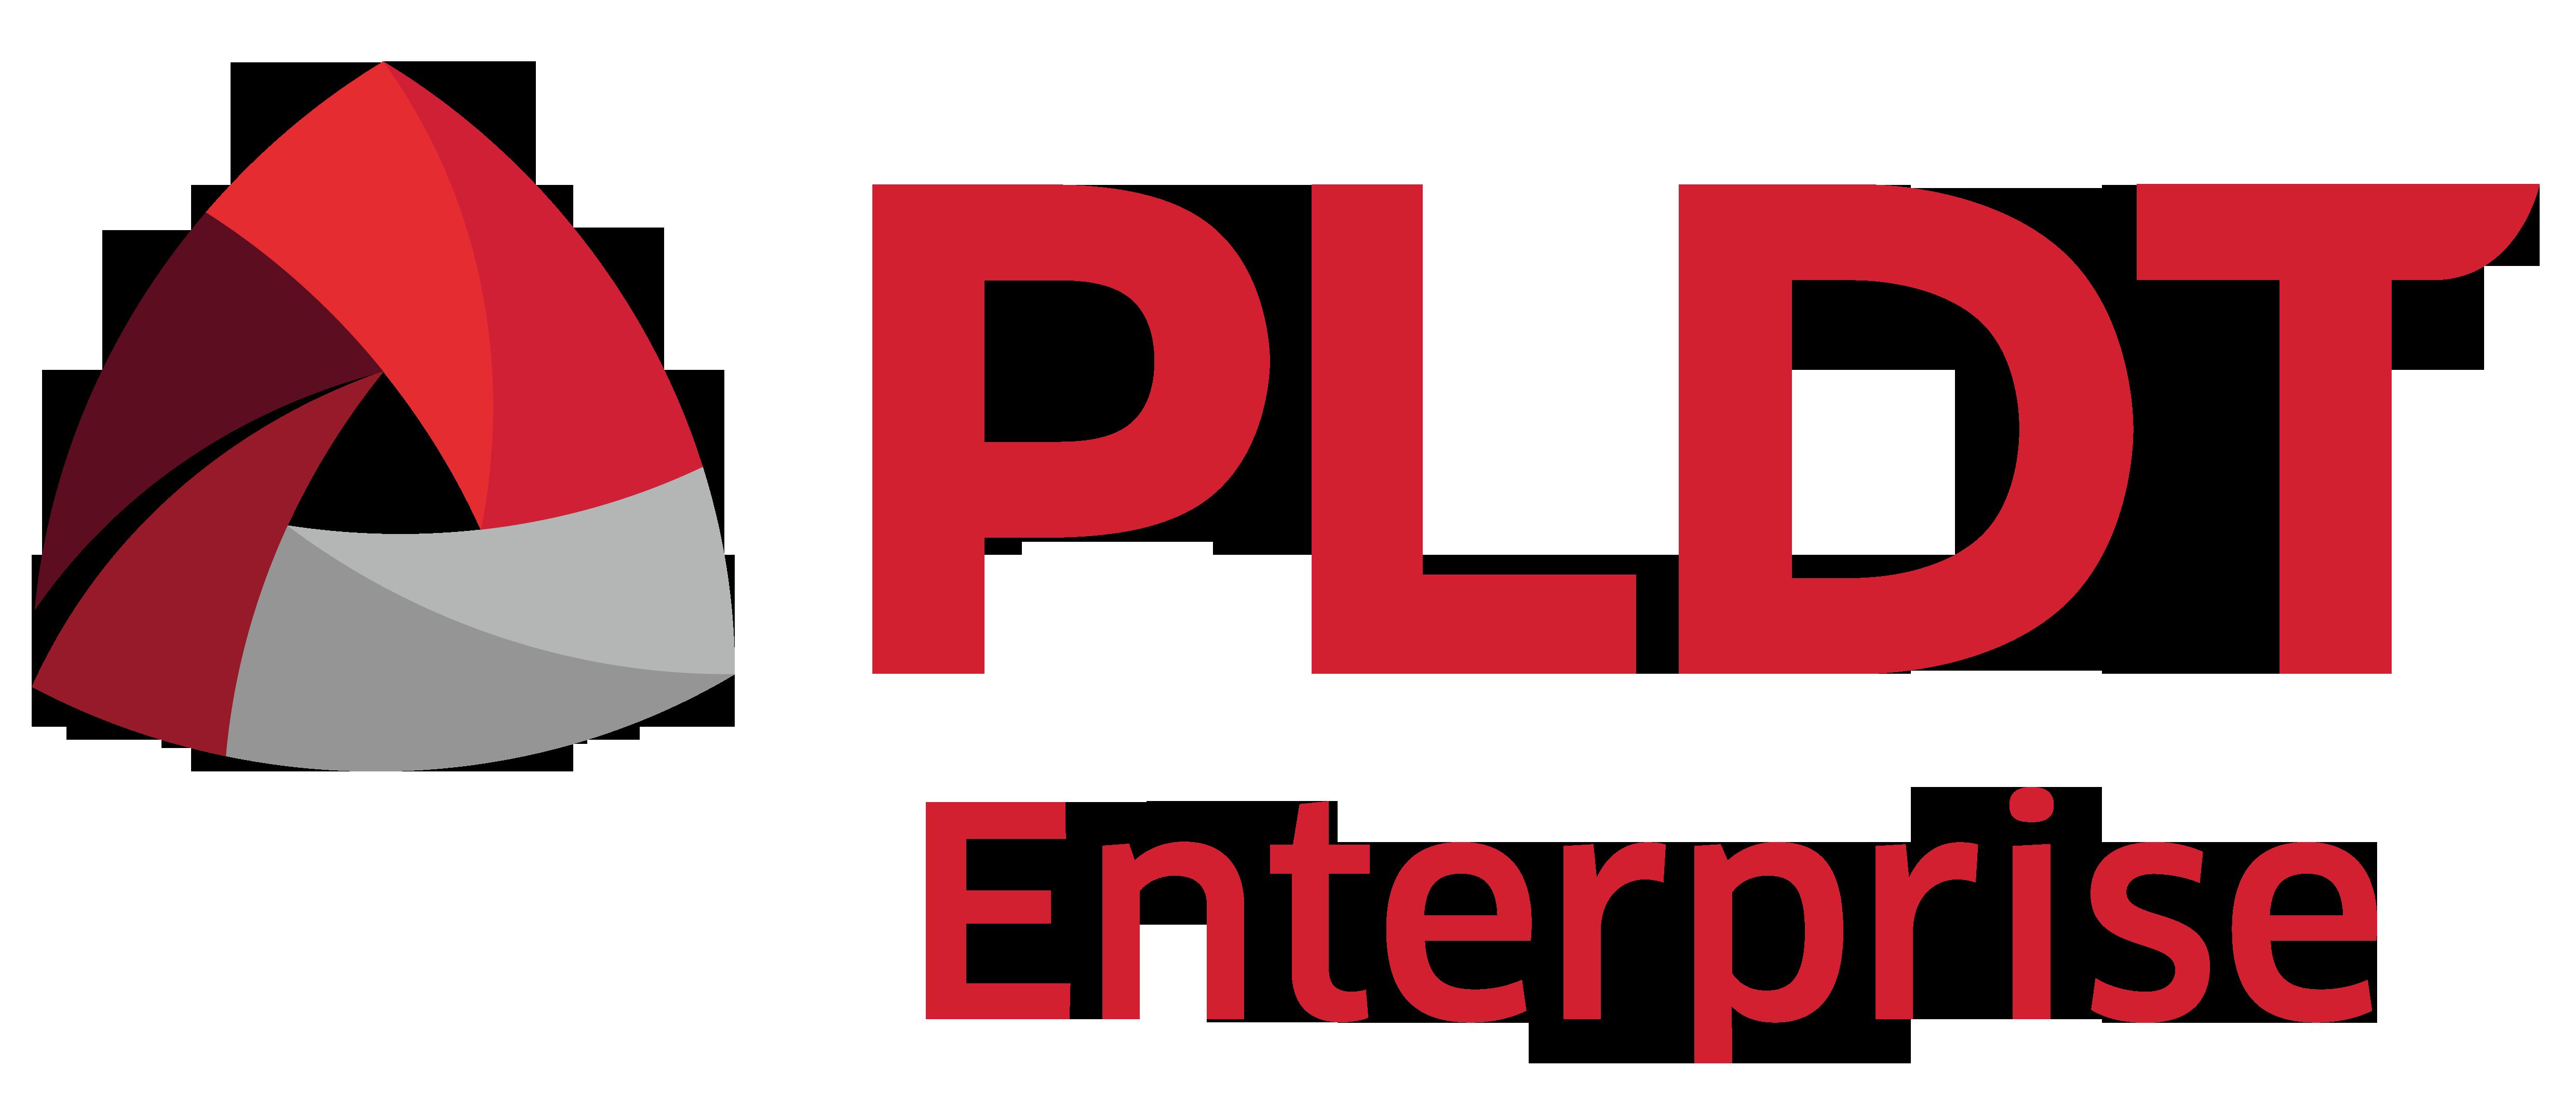 PLDT Enterprise heightens BFSI digital protection with Akamai